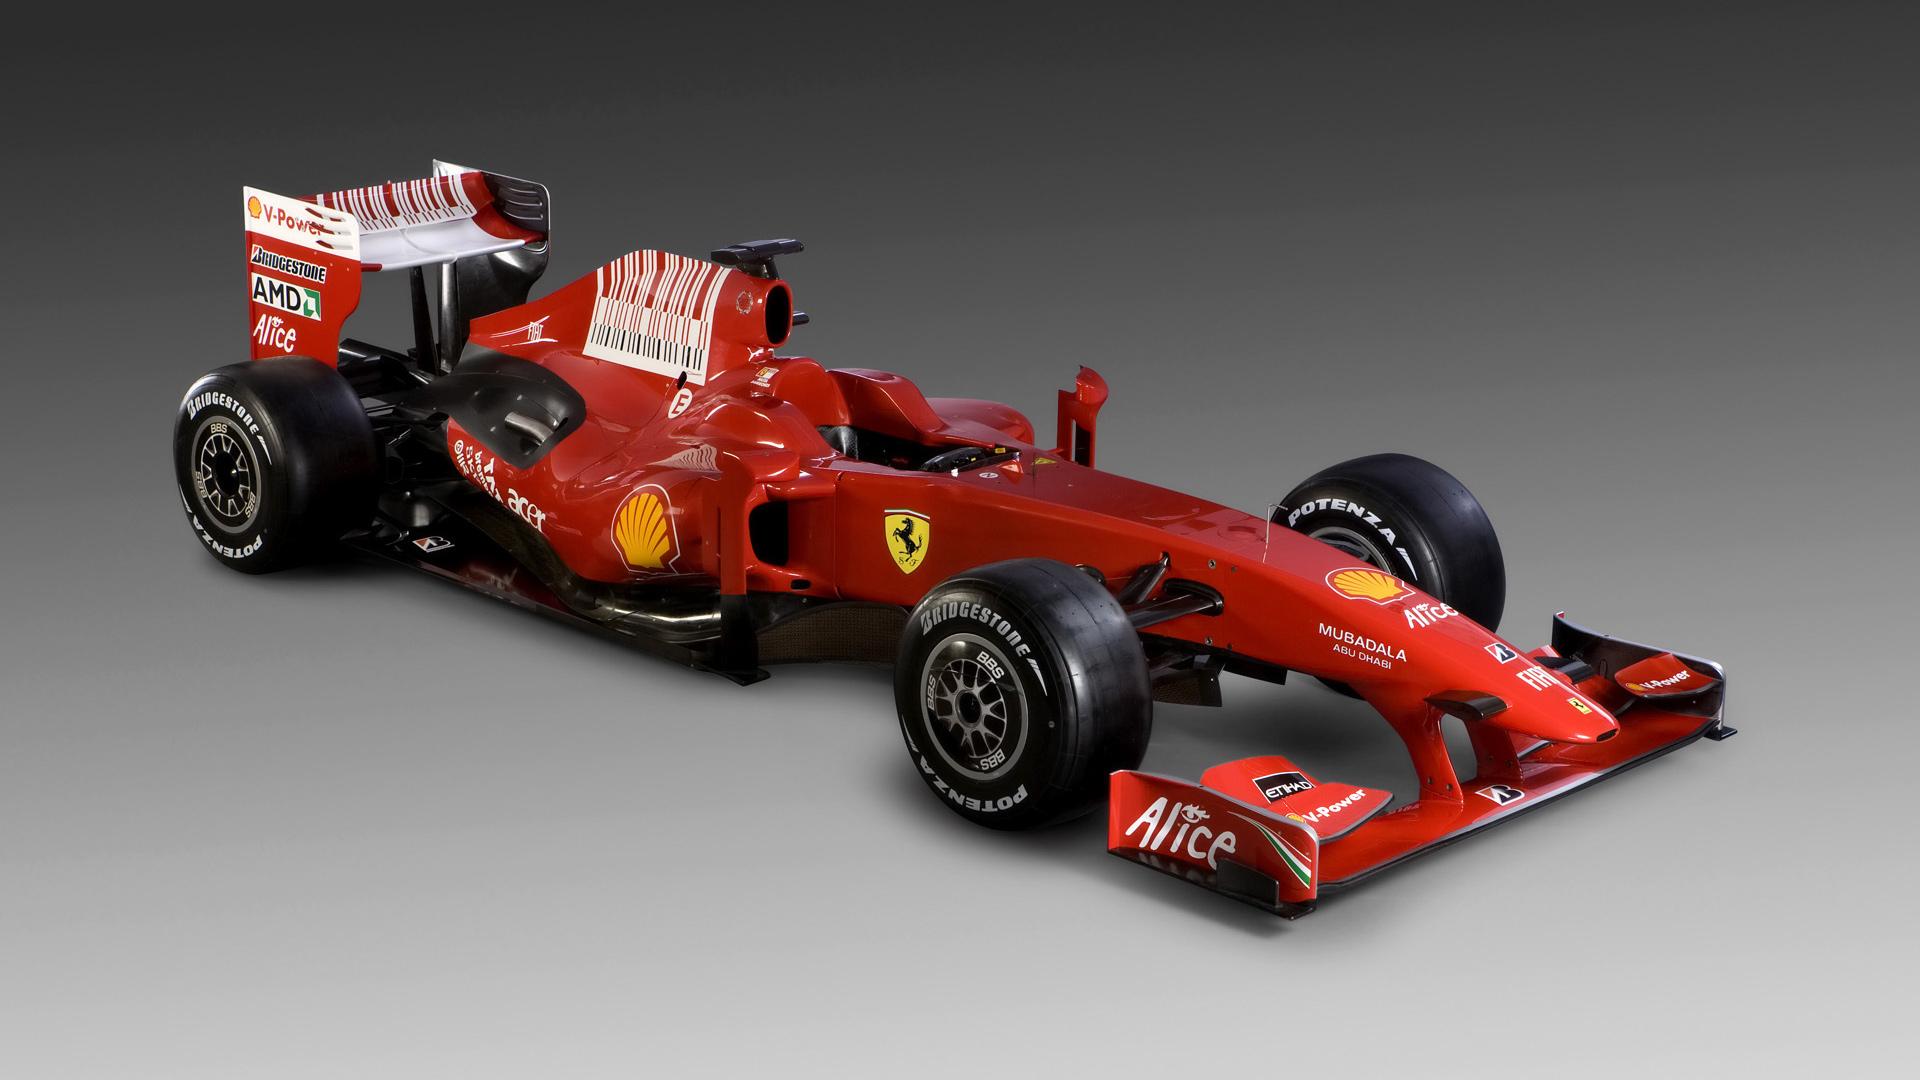 F1 Race Car Wallpapers 1920x1080